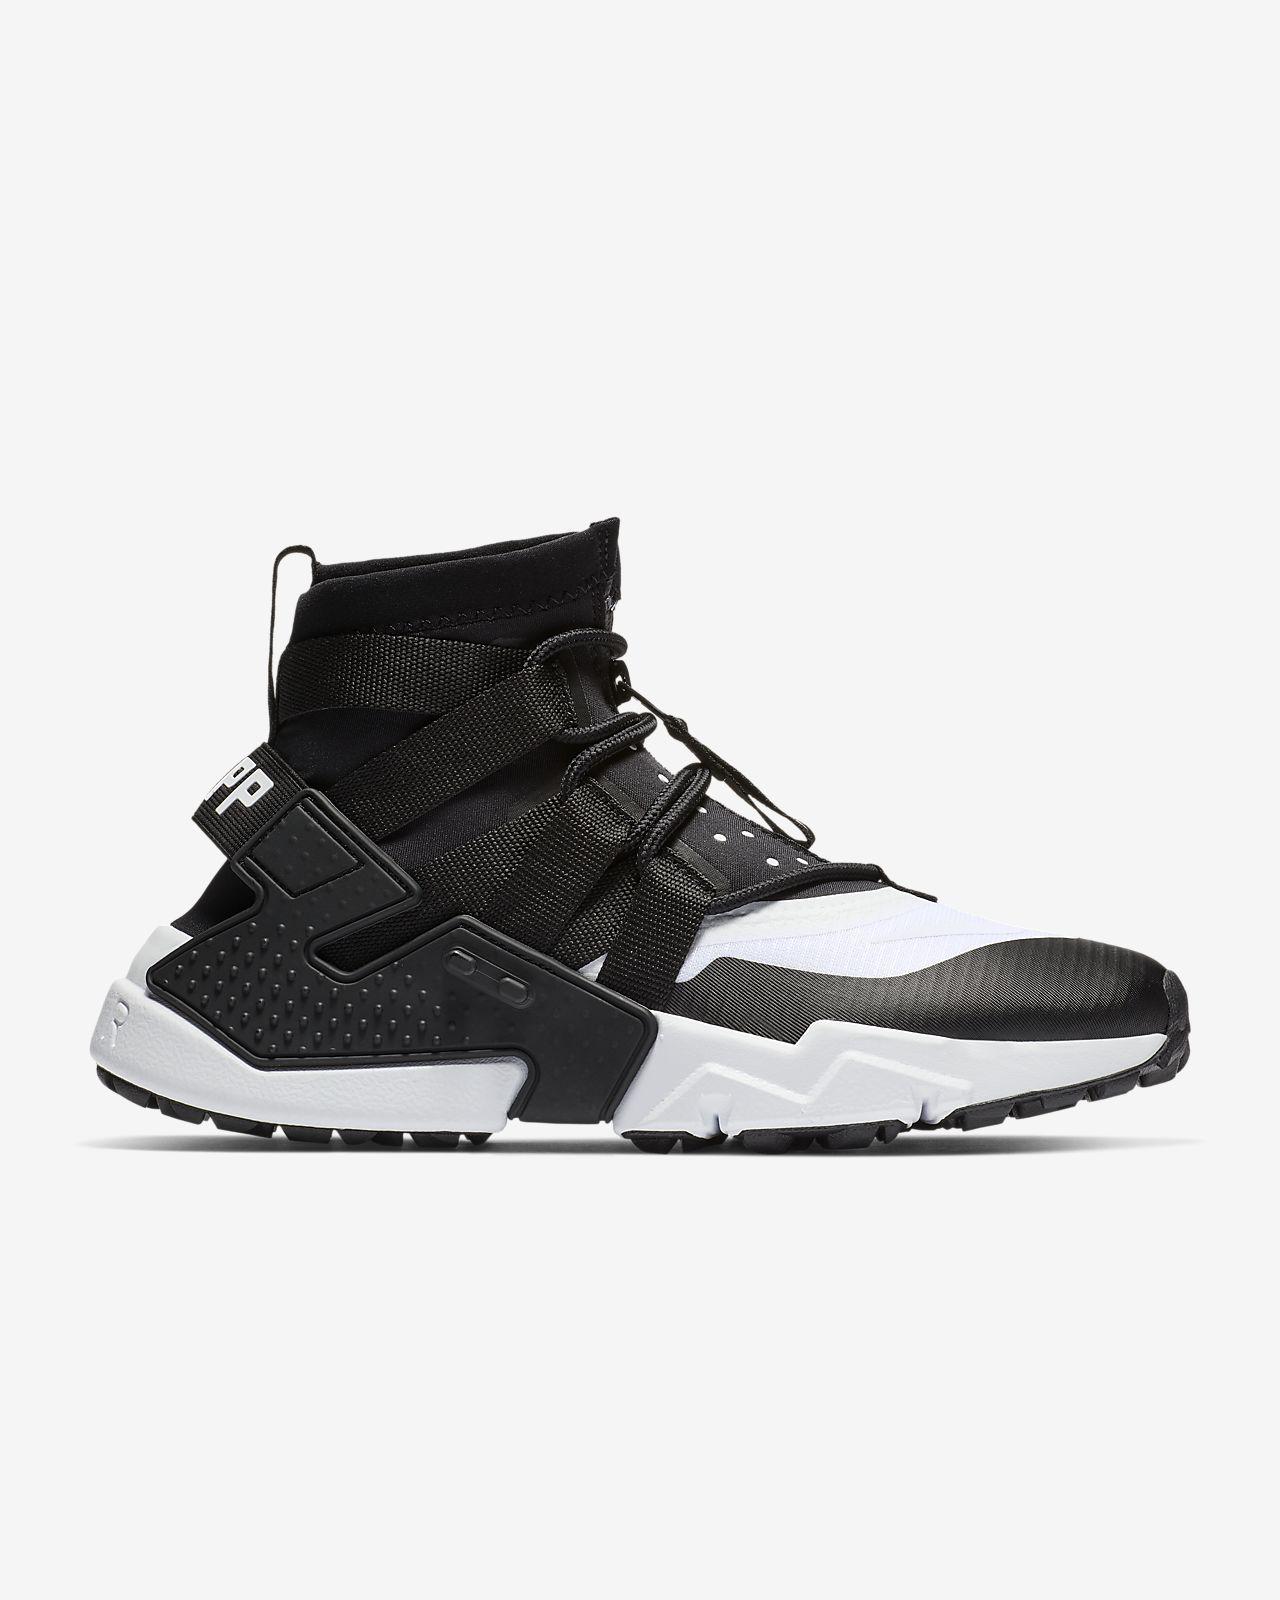 save off ce201 dad89 ... Nike Air Huarache Gripp Men s Shoe